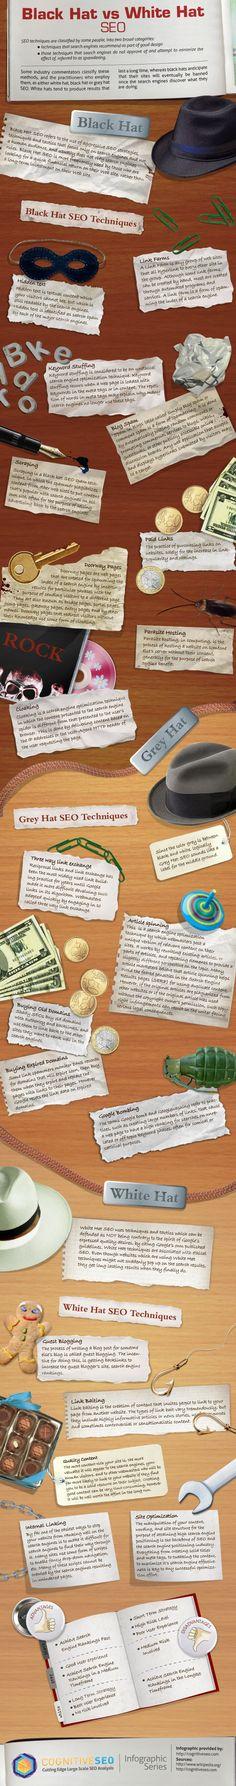 Black Hat vs White Hat SEO: which techniques do you employ? #blackhat #whitehat #grayhat #seo